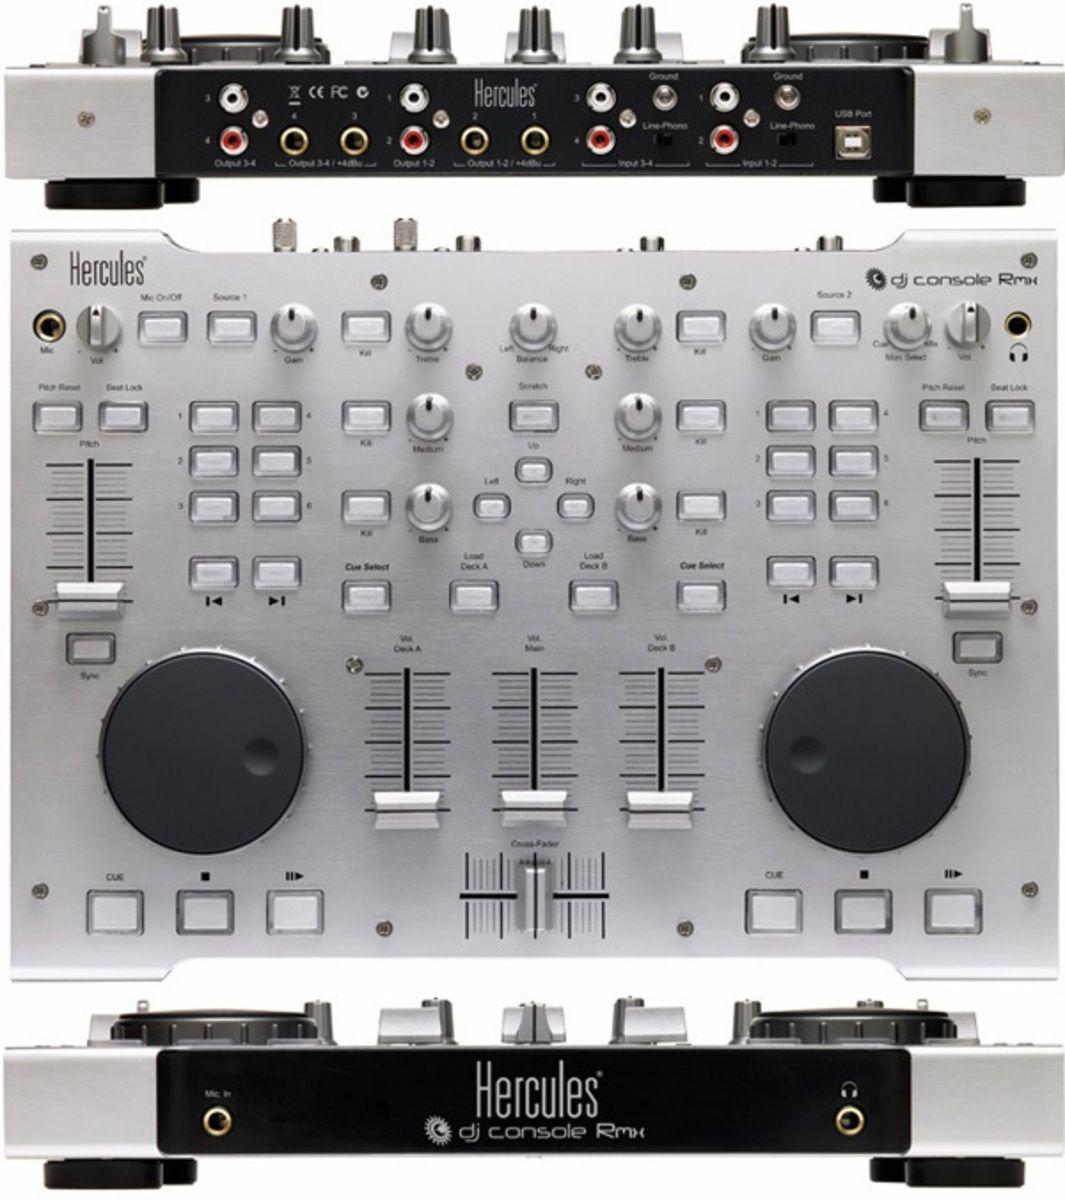 Hercules Dj Console Rmx Image 33873 Audiofanzine